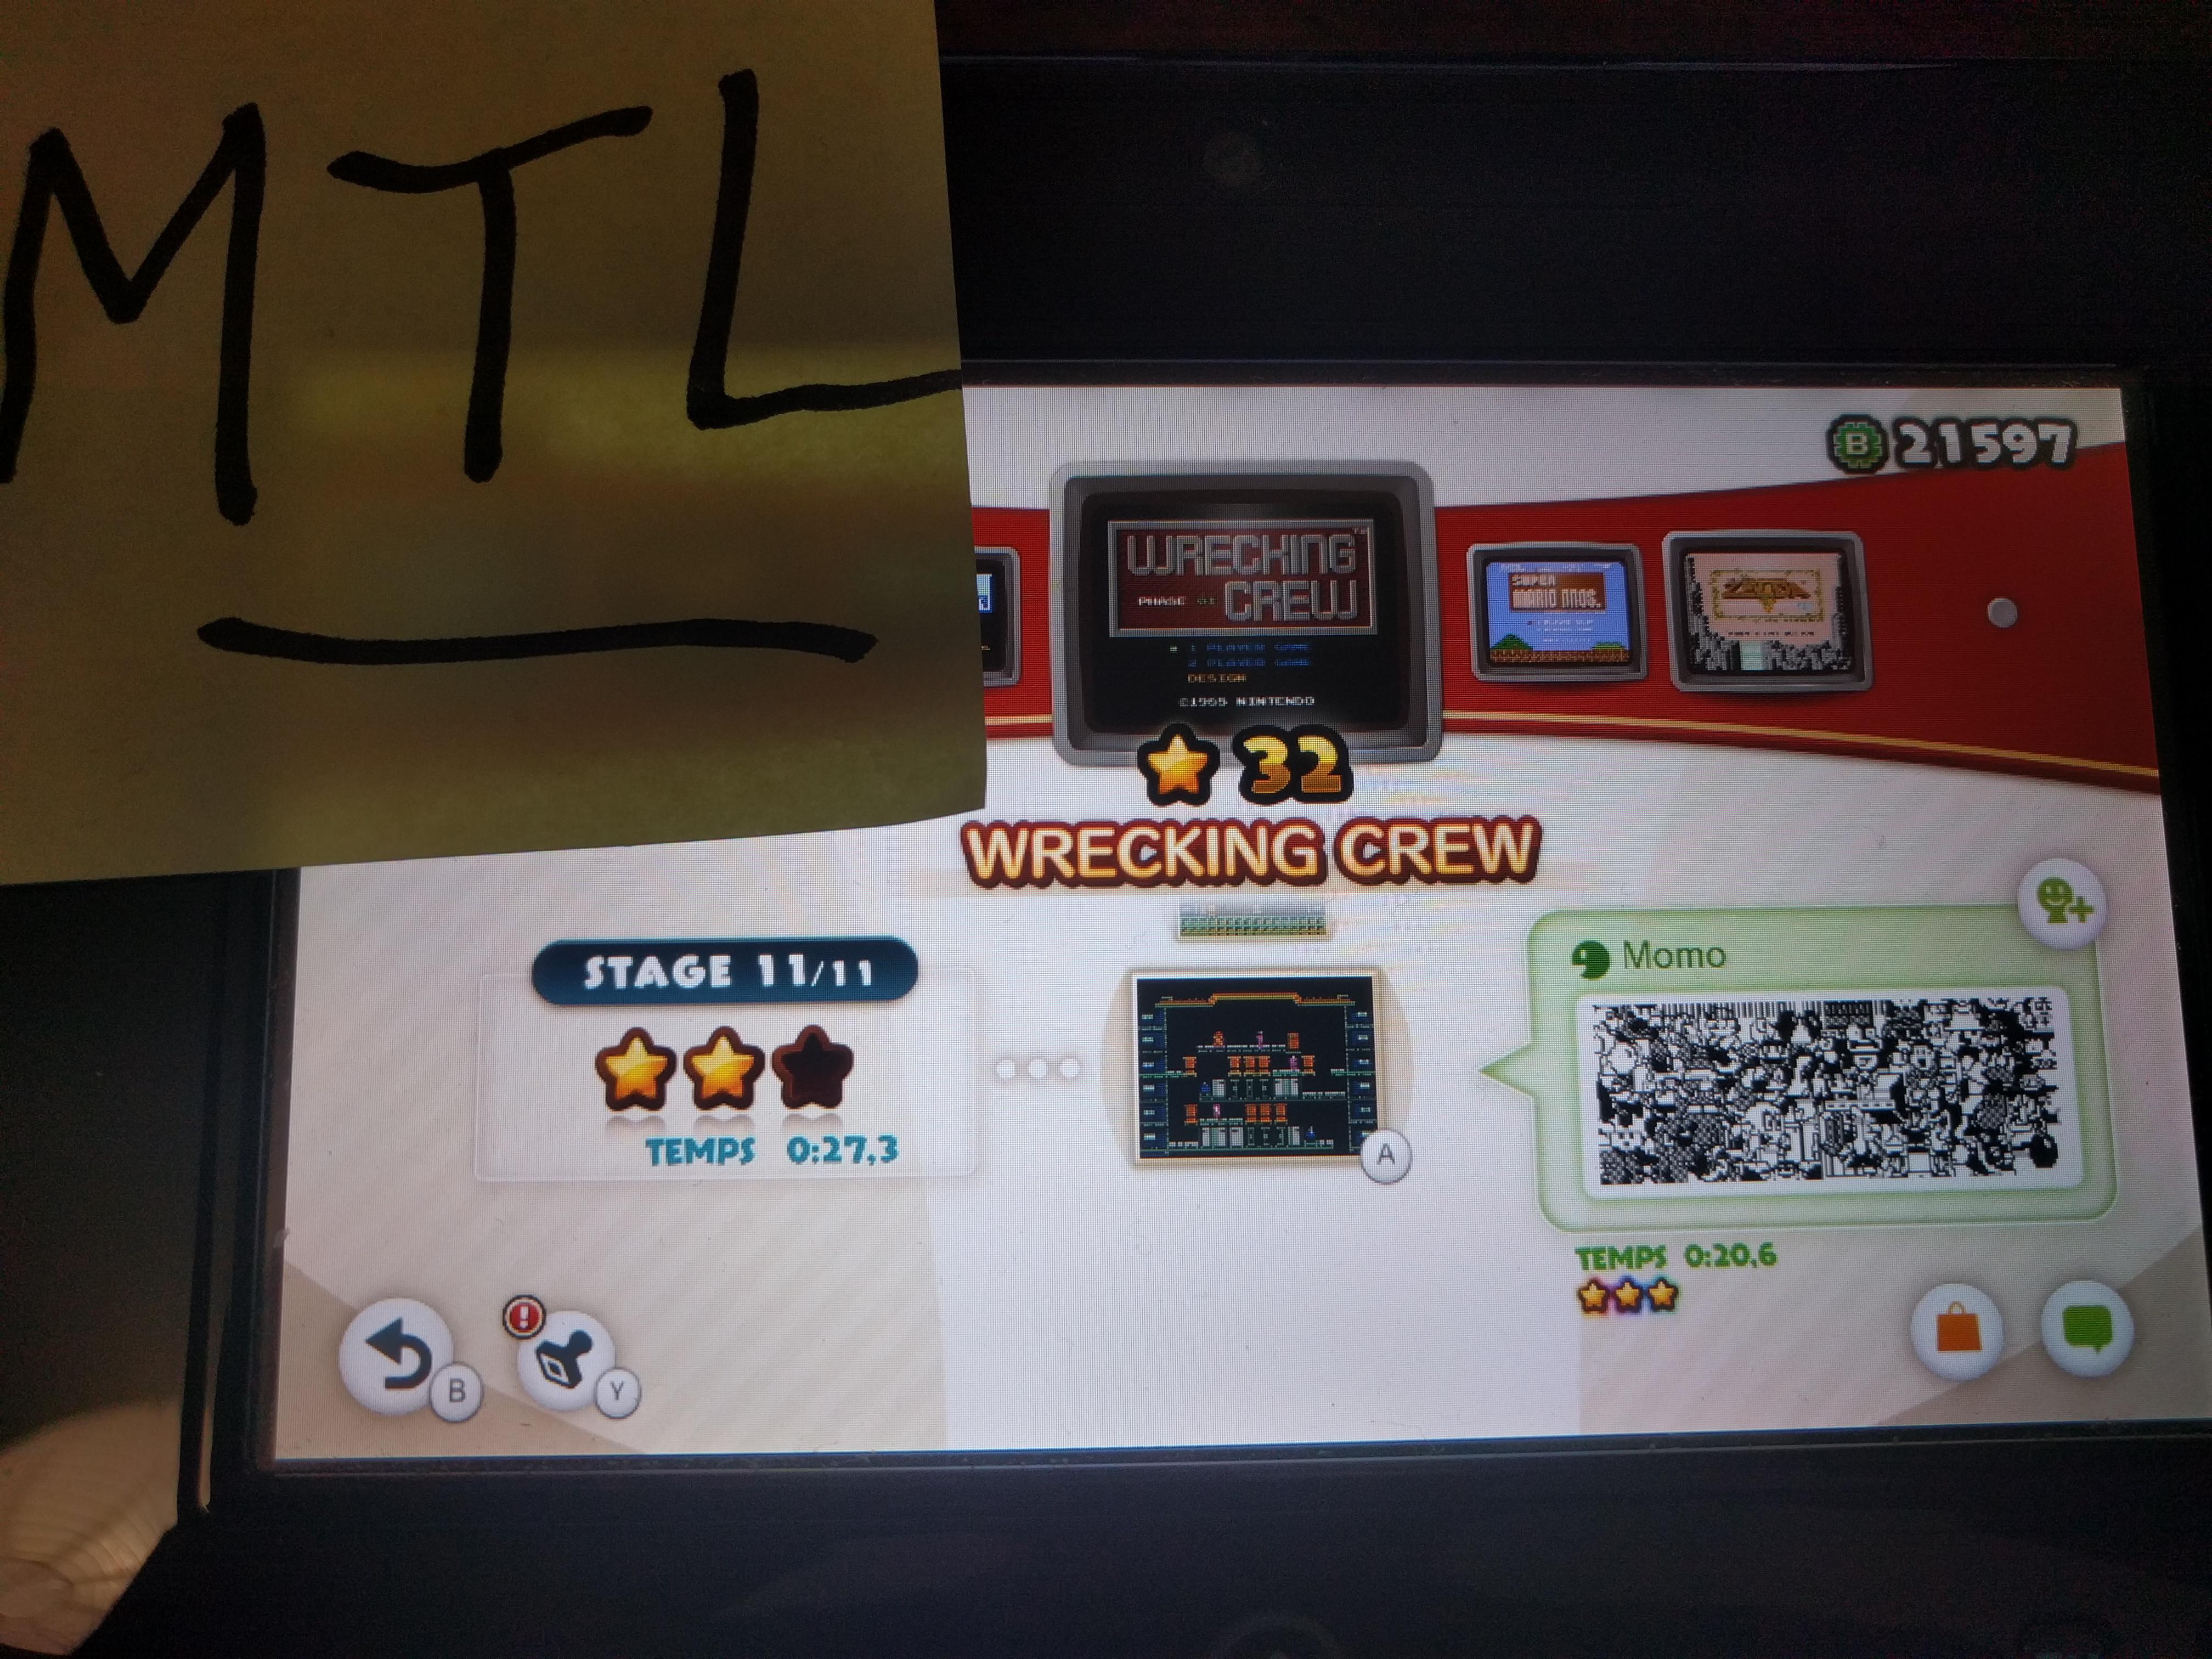 Mantalow: NES Remix: Wrecking Crew: Stage 11 (Wii U) 0:00:27.3 points on 2016-06-15 11:19:43